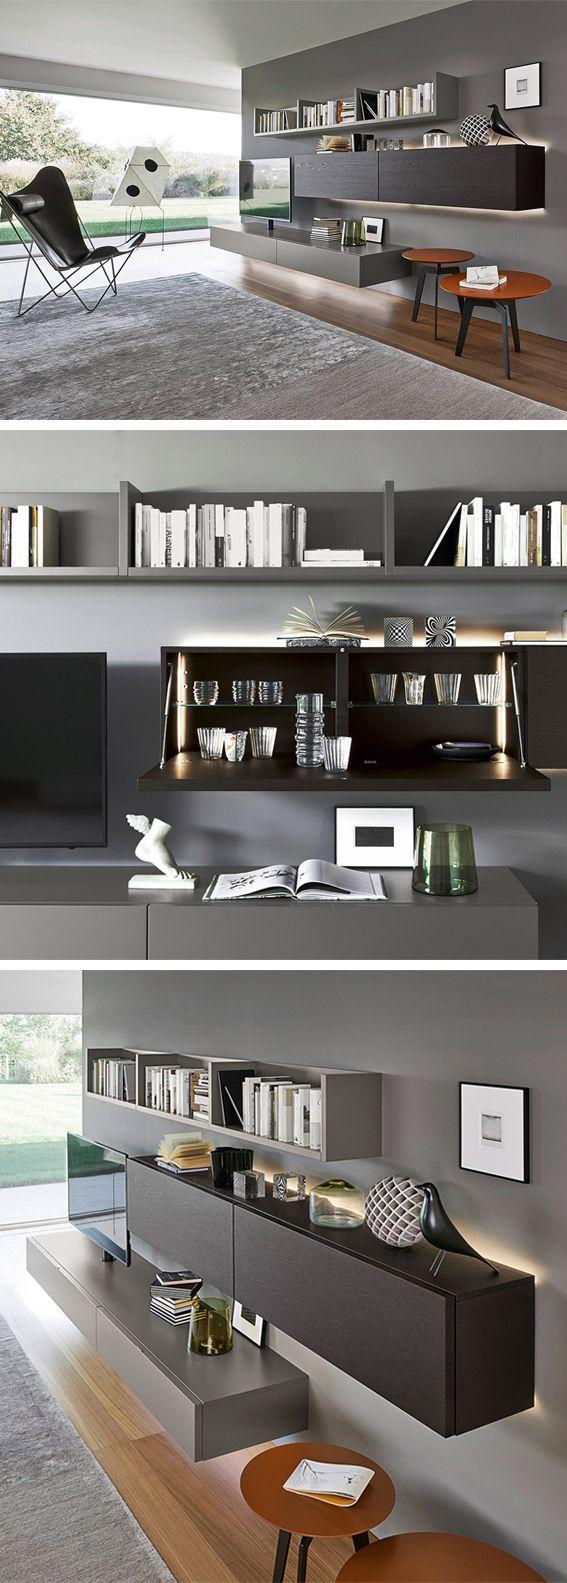 livitalia wohnwand c60 tv wohnw nde. Black Bedroom Furniture Sets. Home Design Ideas